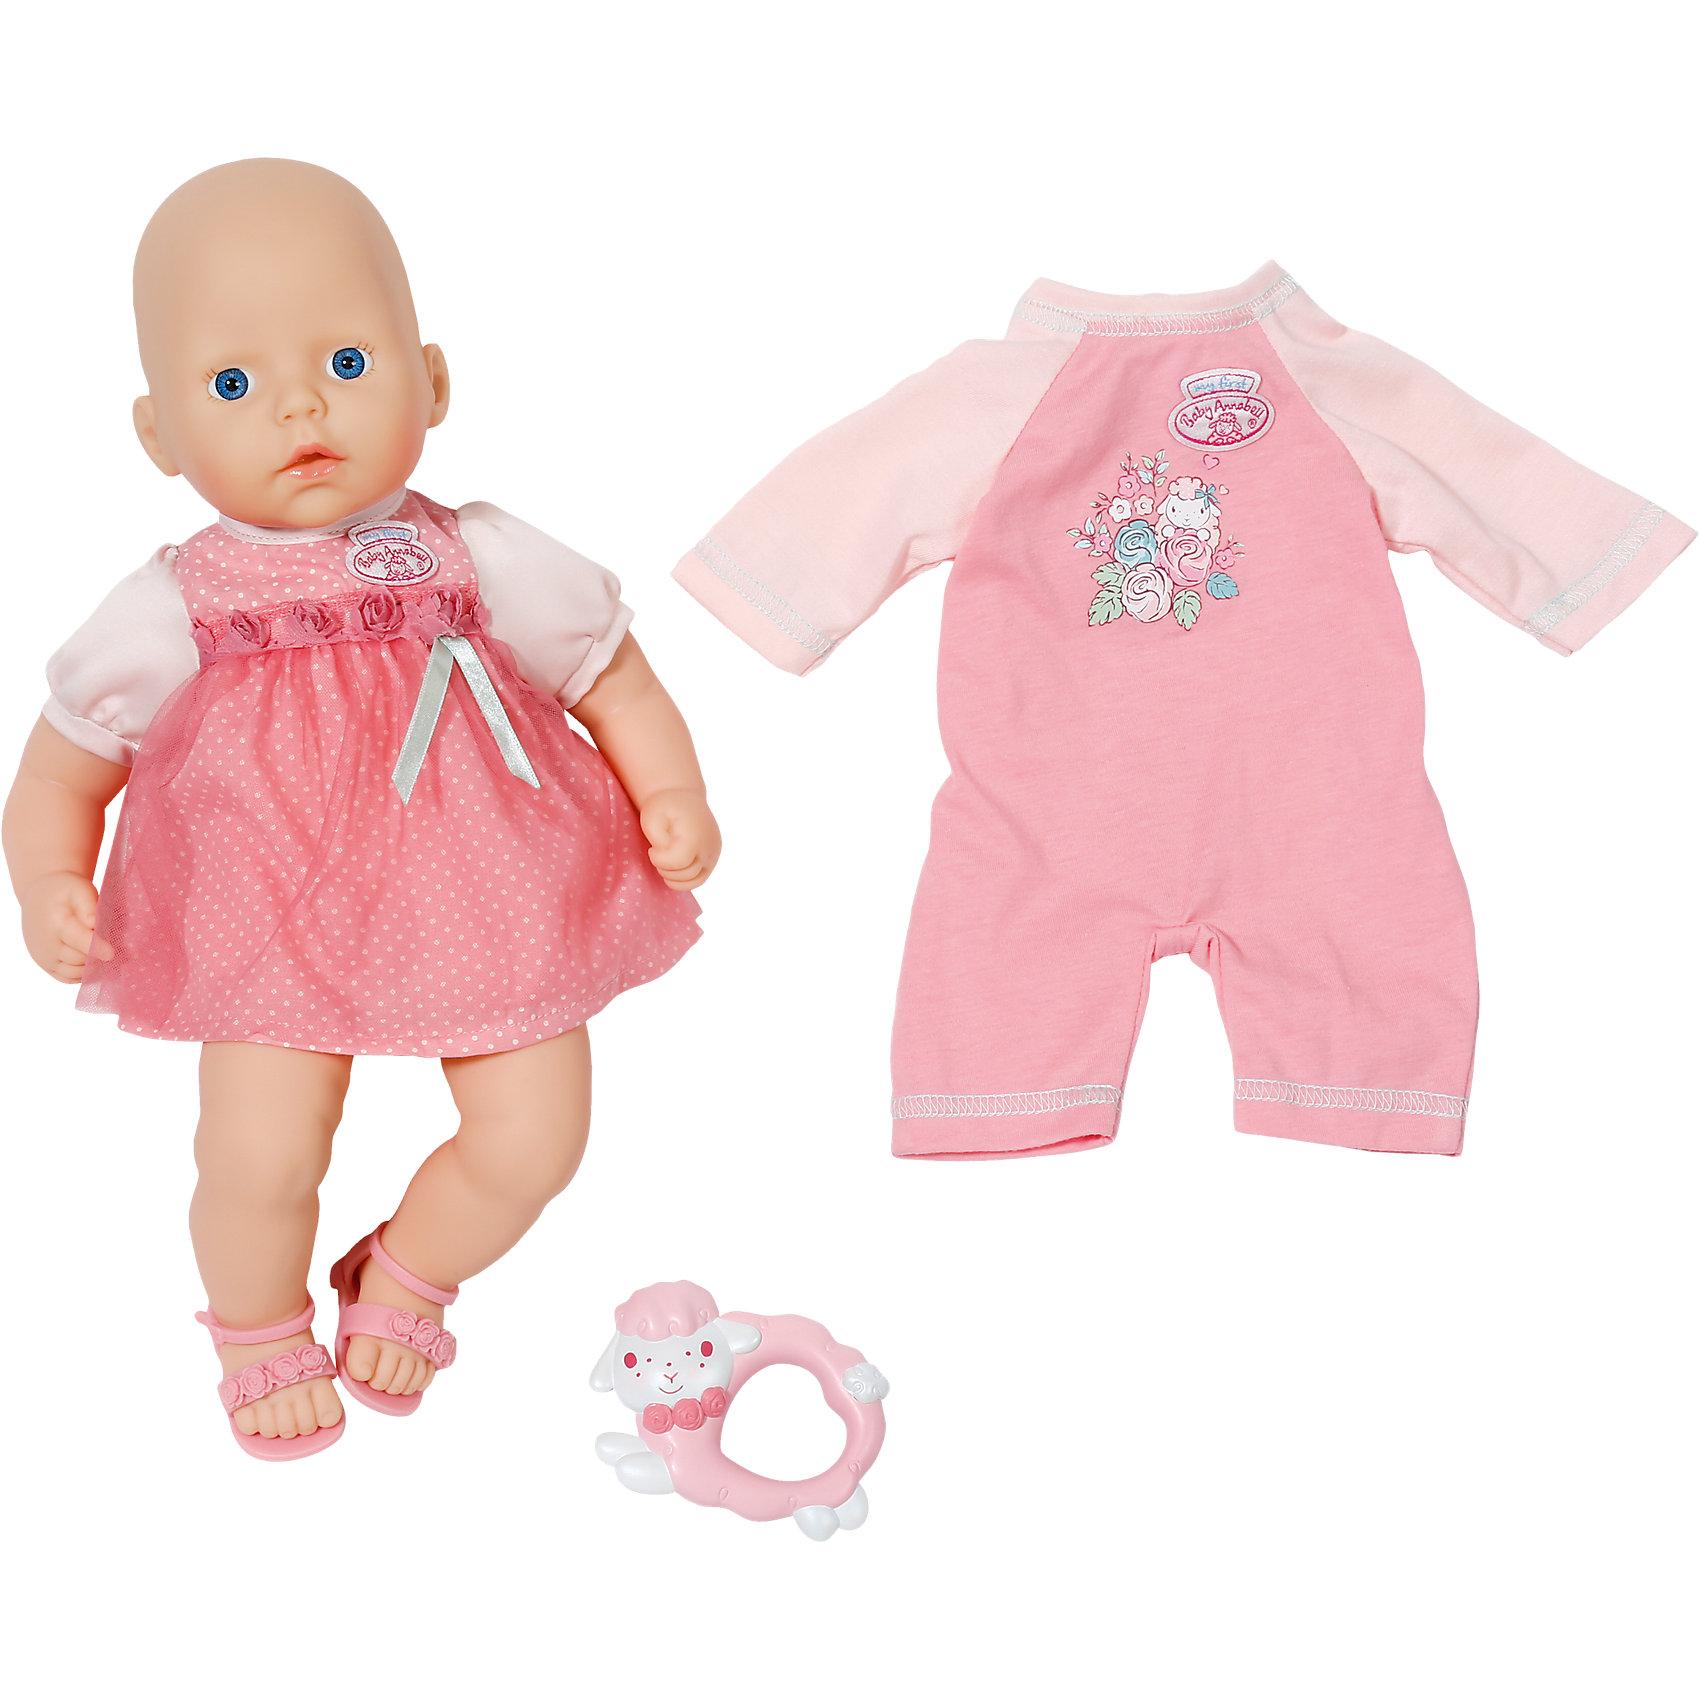 Кукла с дополнительным набором одежды, 36 см, my first Baby Annabell